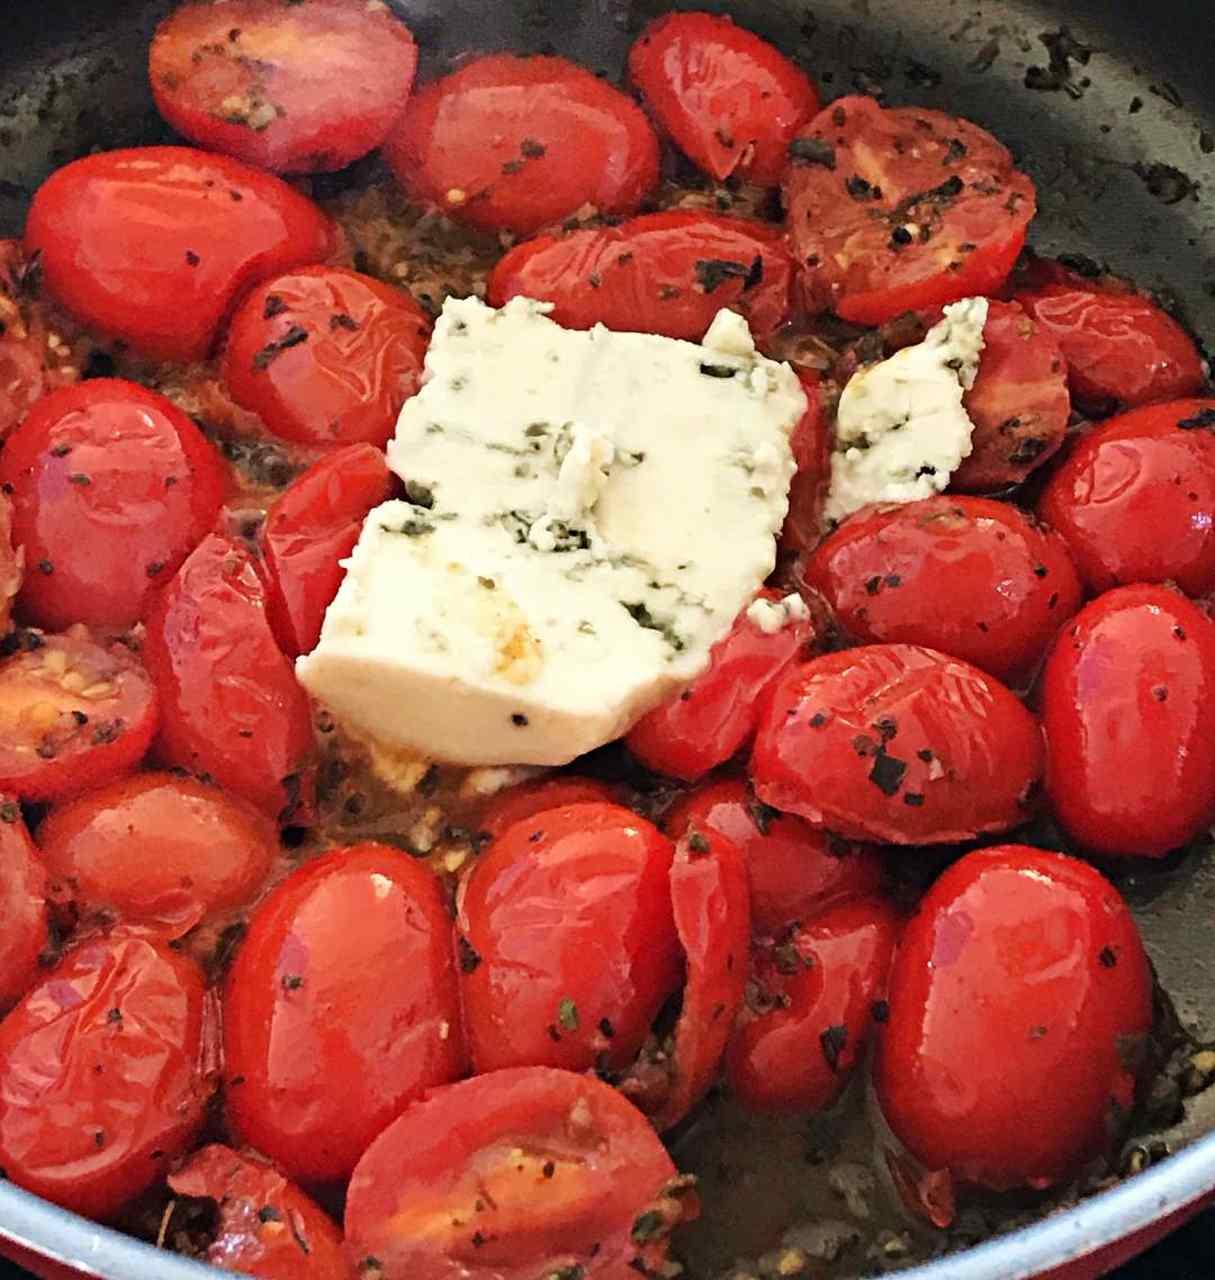 Confit de tomate cereja com queijo gorgonzola